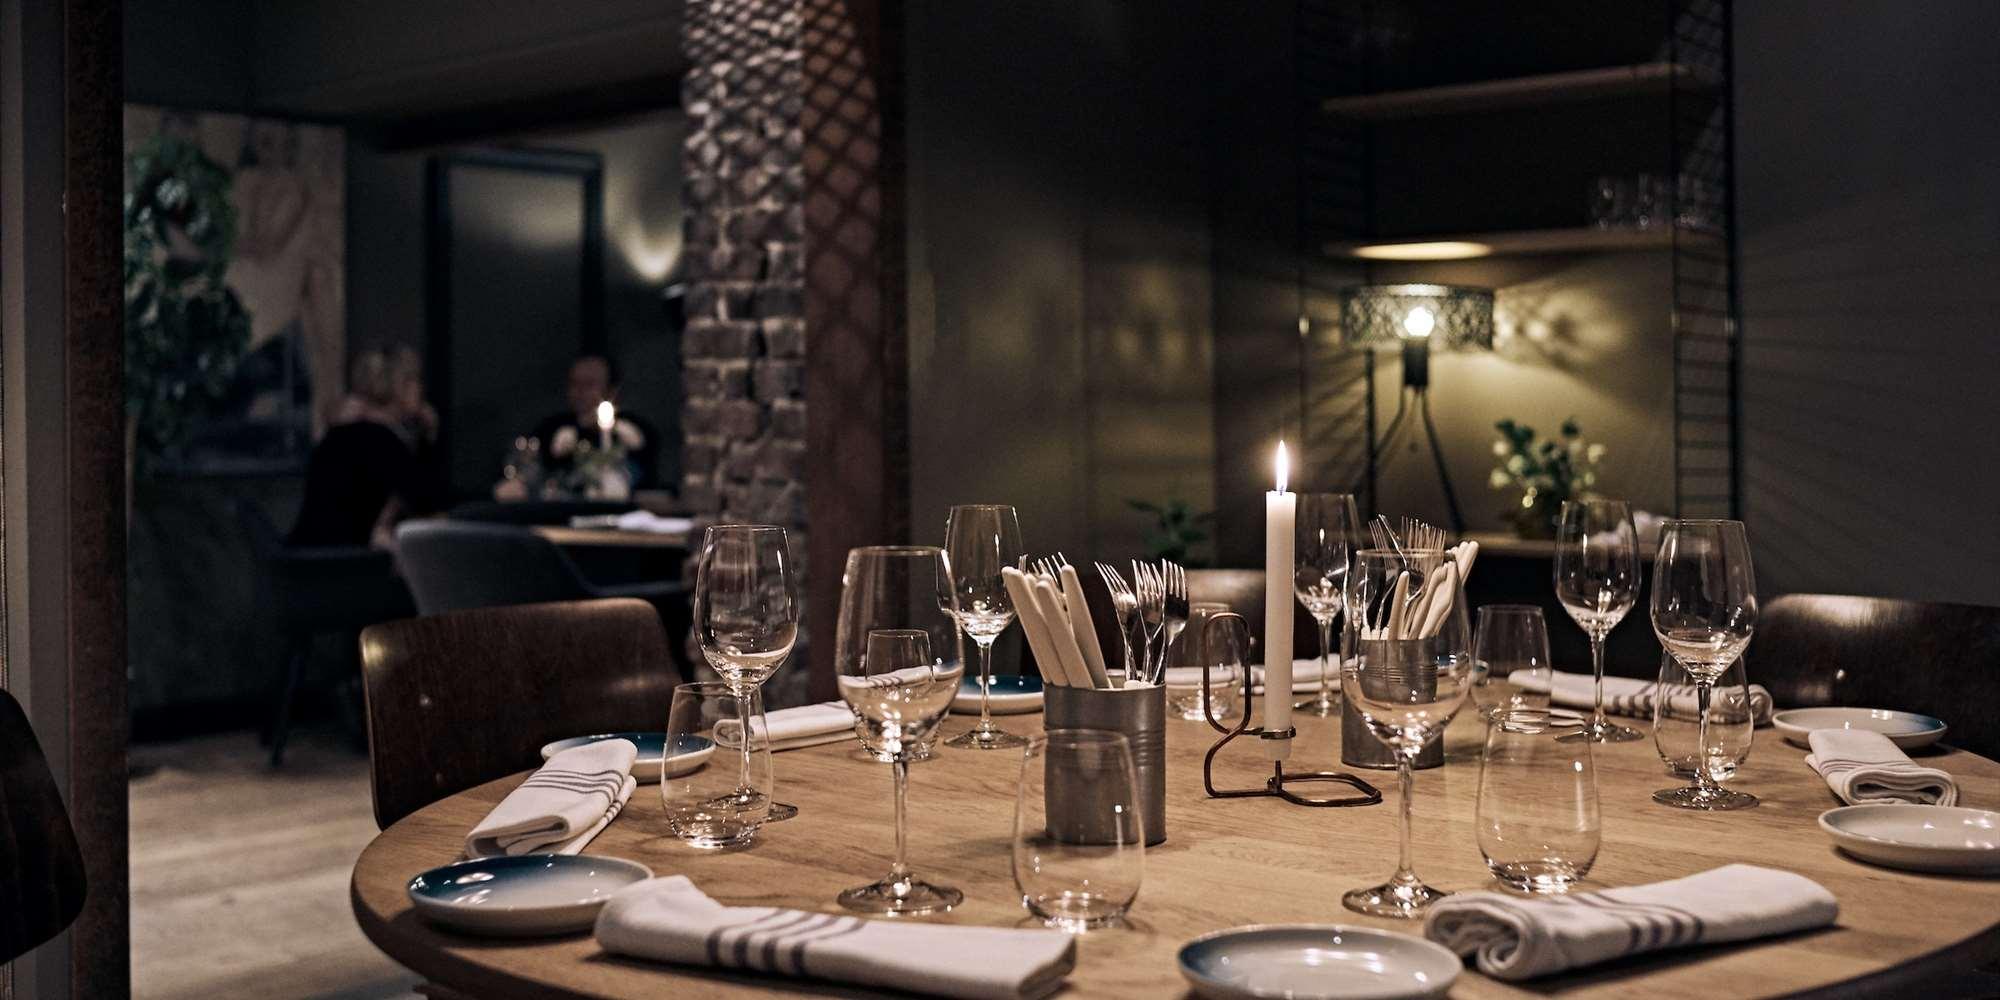 Colonialen 44 Restaurant & Food Bar